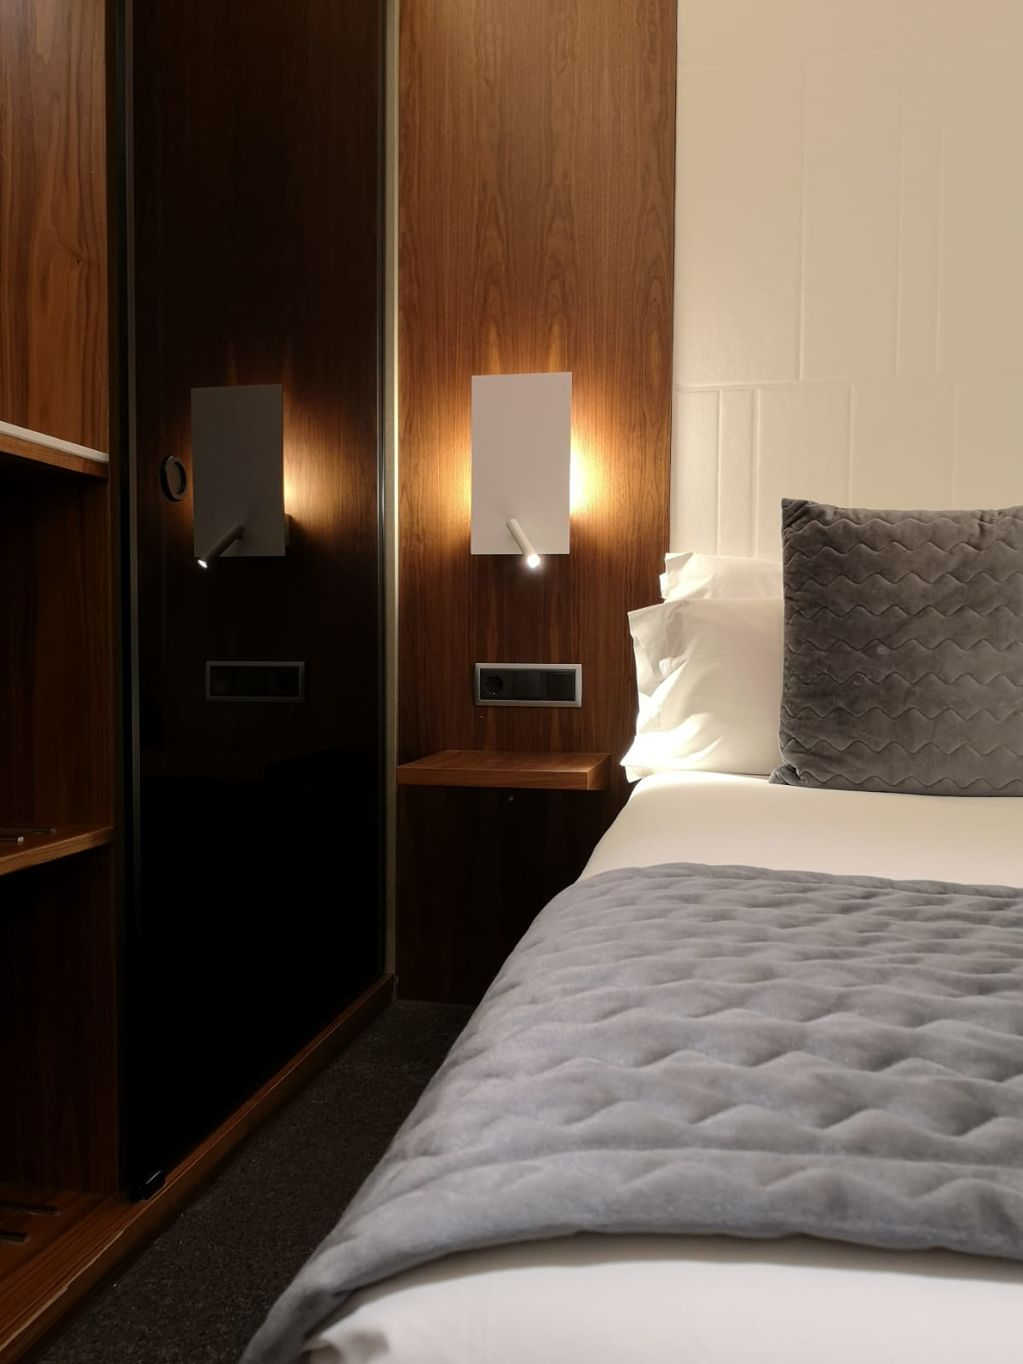 Hotel Dante, Barcelona - 151ec-e54cb31a-c969-44a7-a904-be172a4281d4.JPG